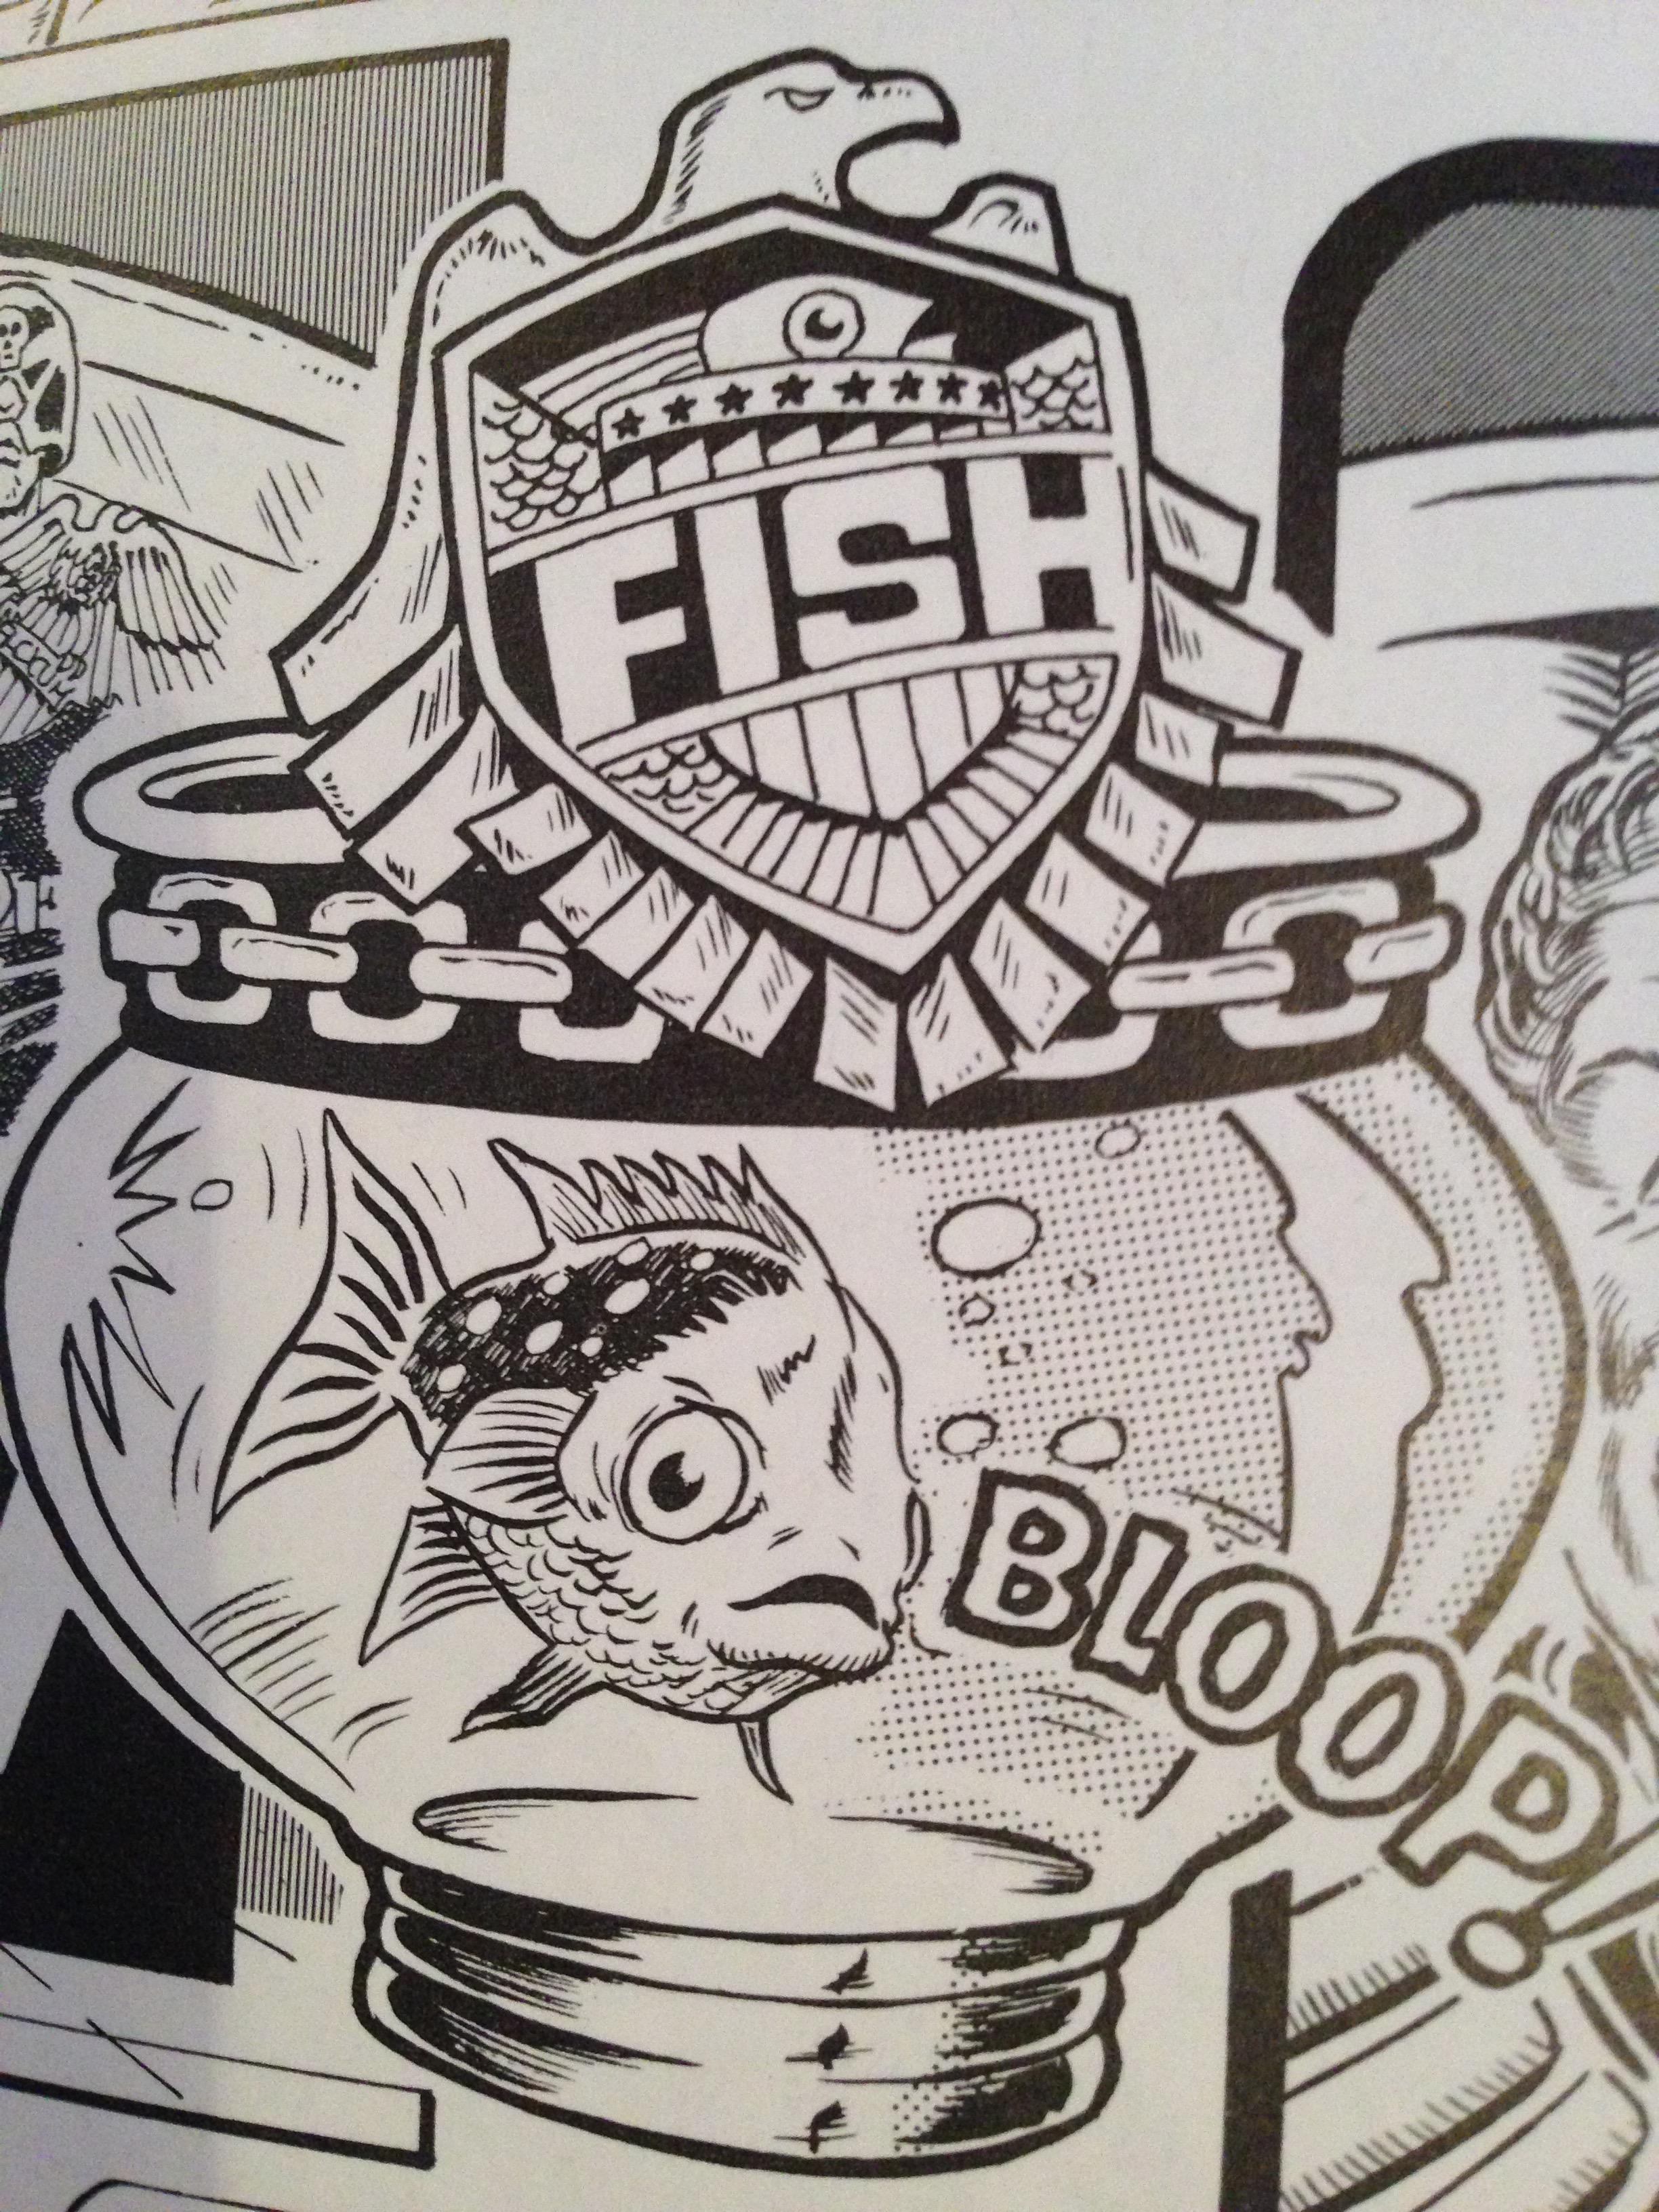 JudgeFish